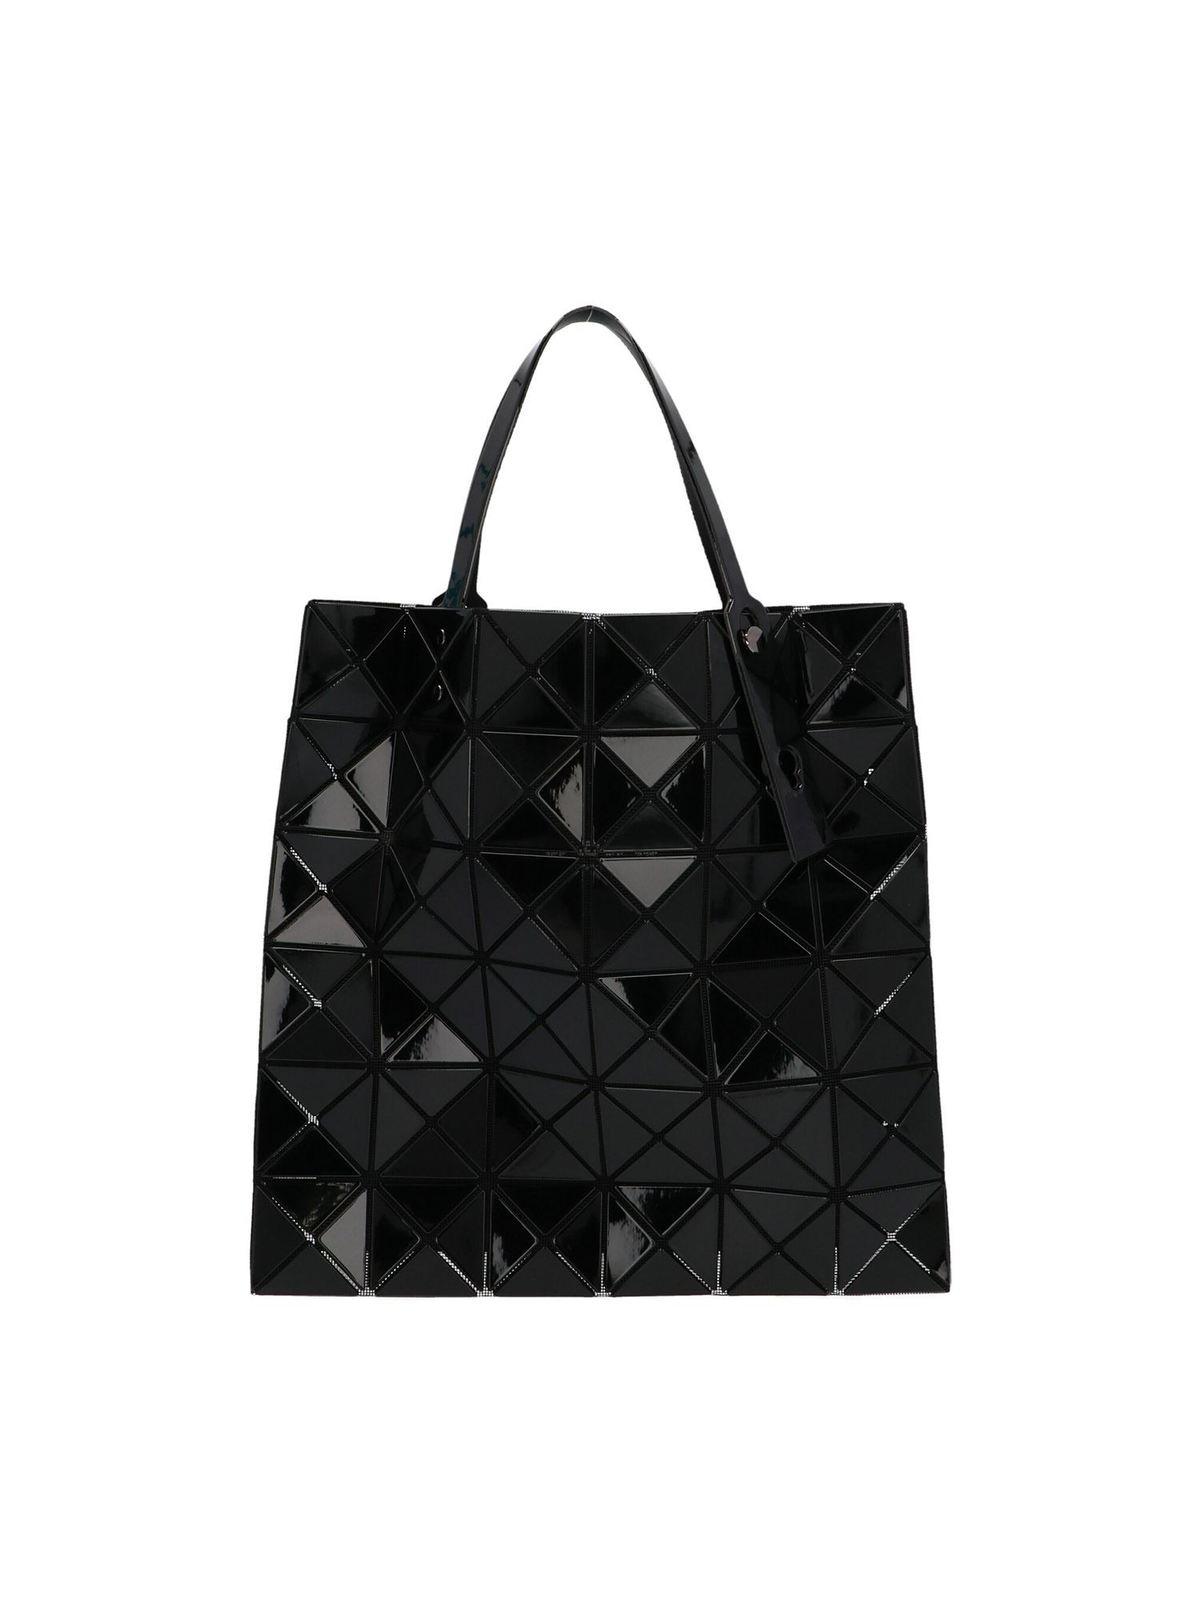 Bao Bao Issey Miyake Lucent Shopper Bag In Shiny Black